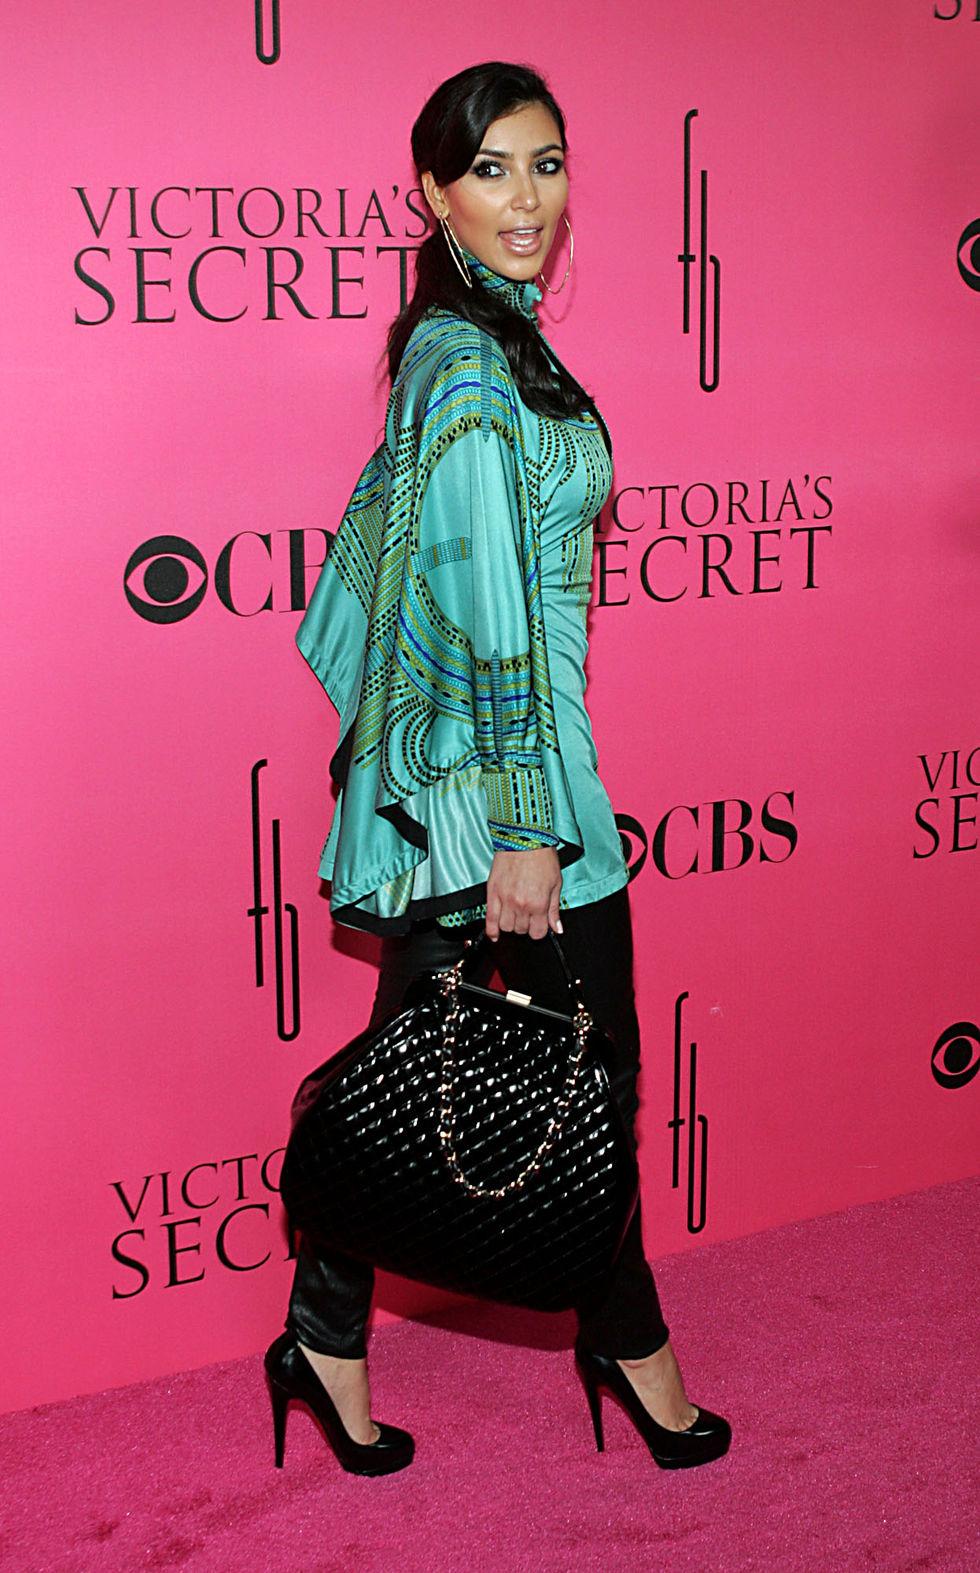 kim-and-kourtney-kardashian-2008-victorias-secret-fashion-show-01